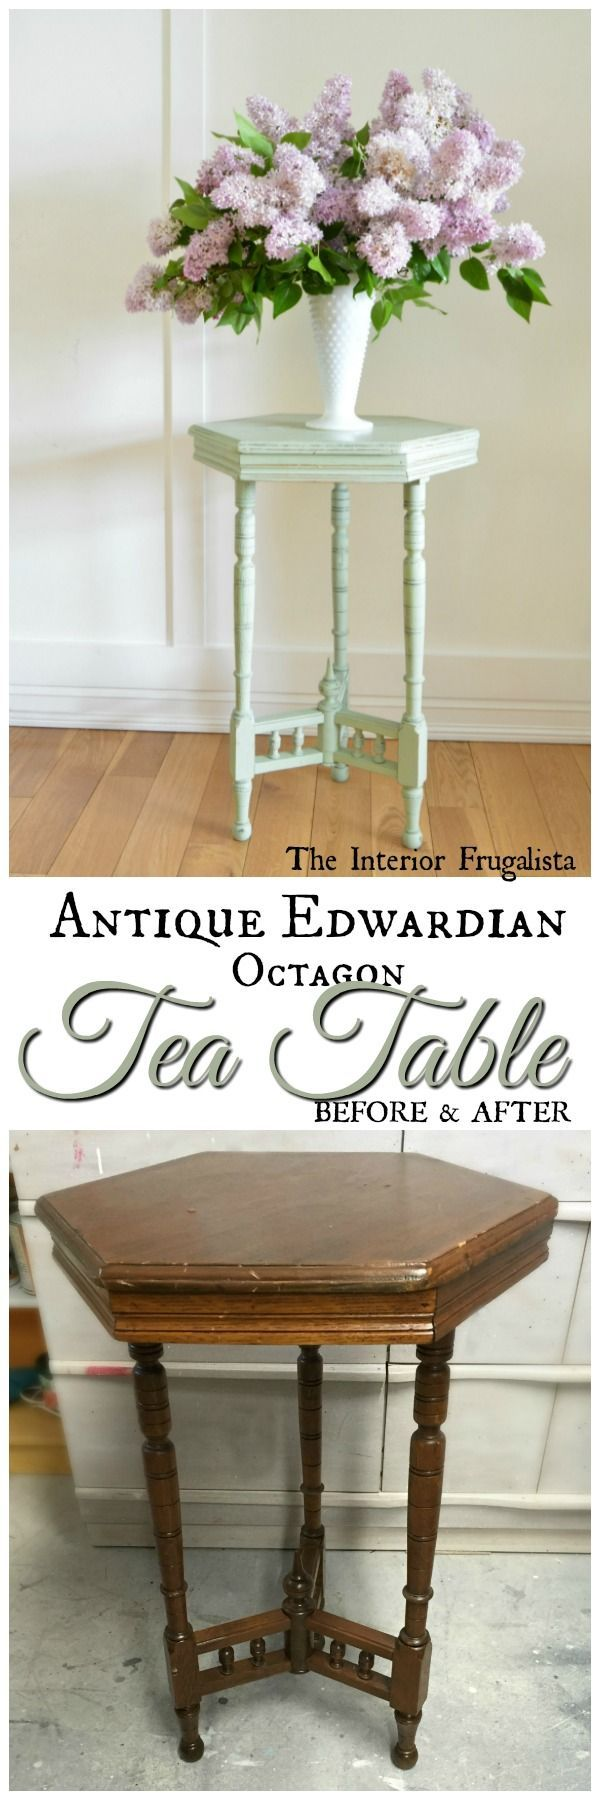 Best 25+ Octagon table ideas on Pinterest | DIY 70s furniture ...